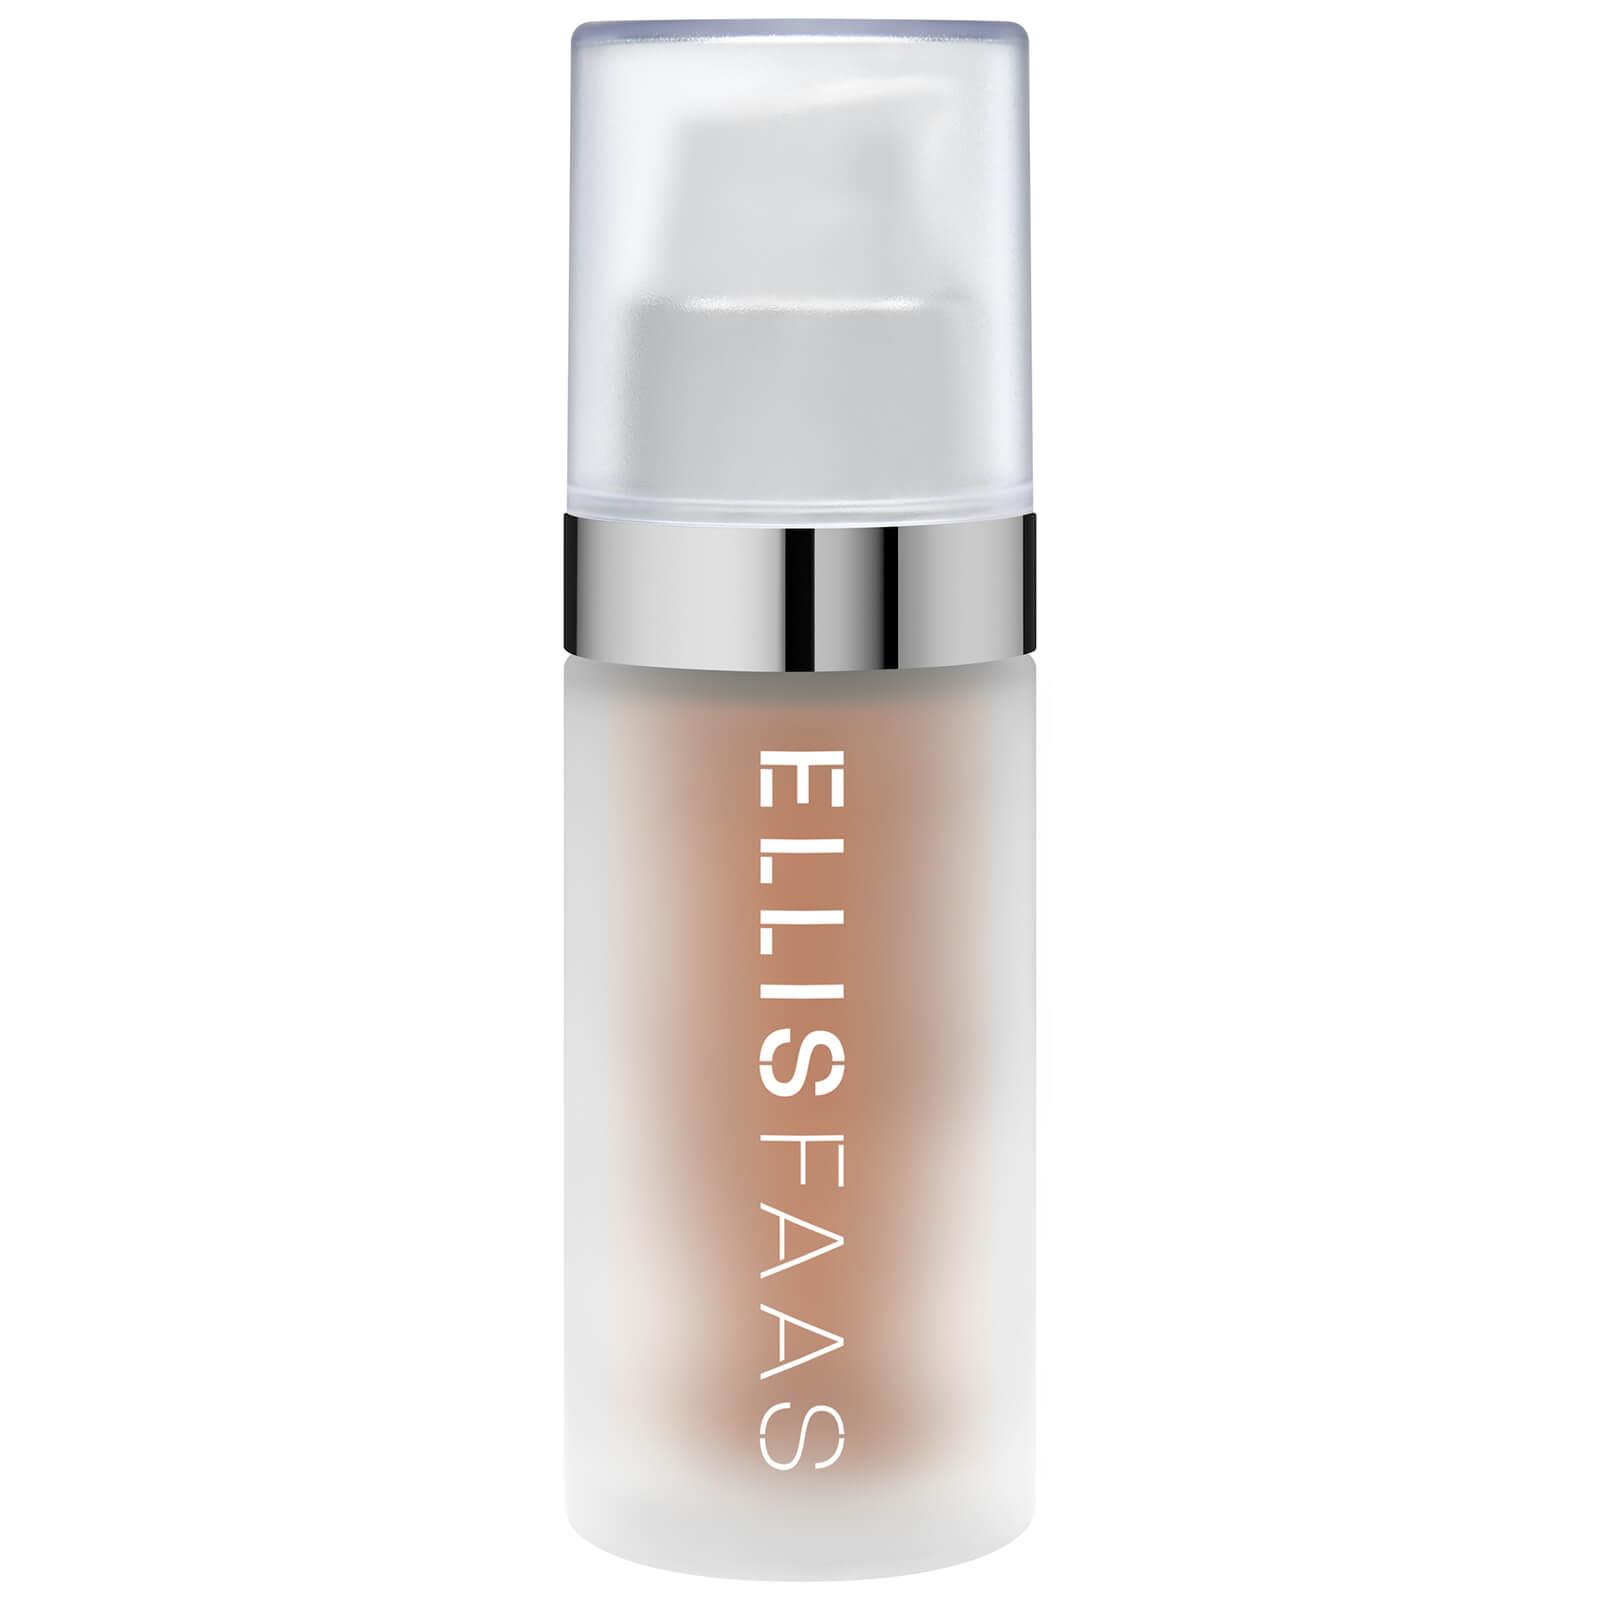 Ellis Faas Skin Veil Bottle (Various Shades) - Medium Dark